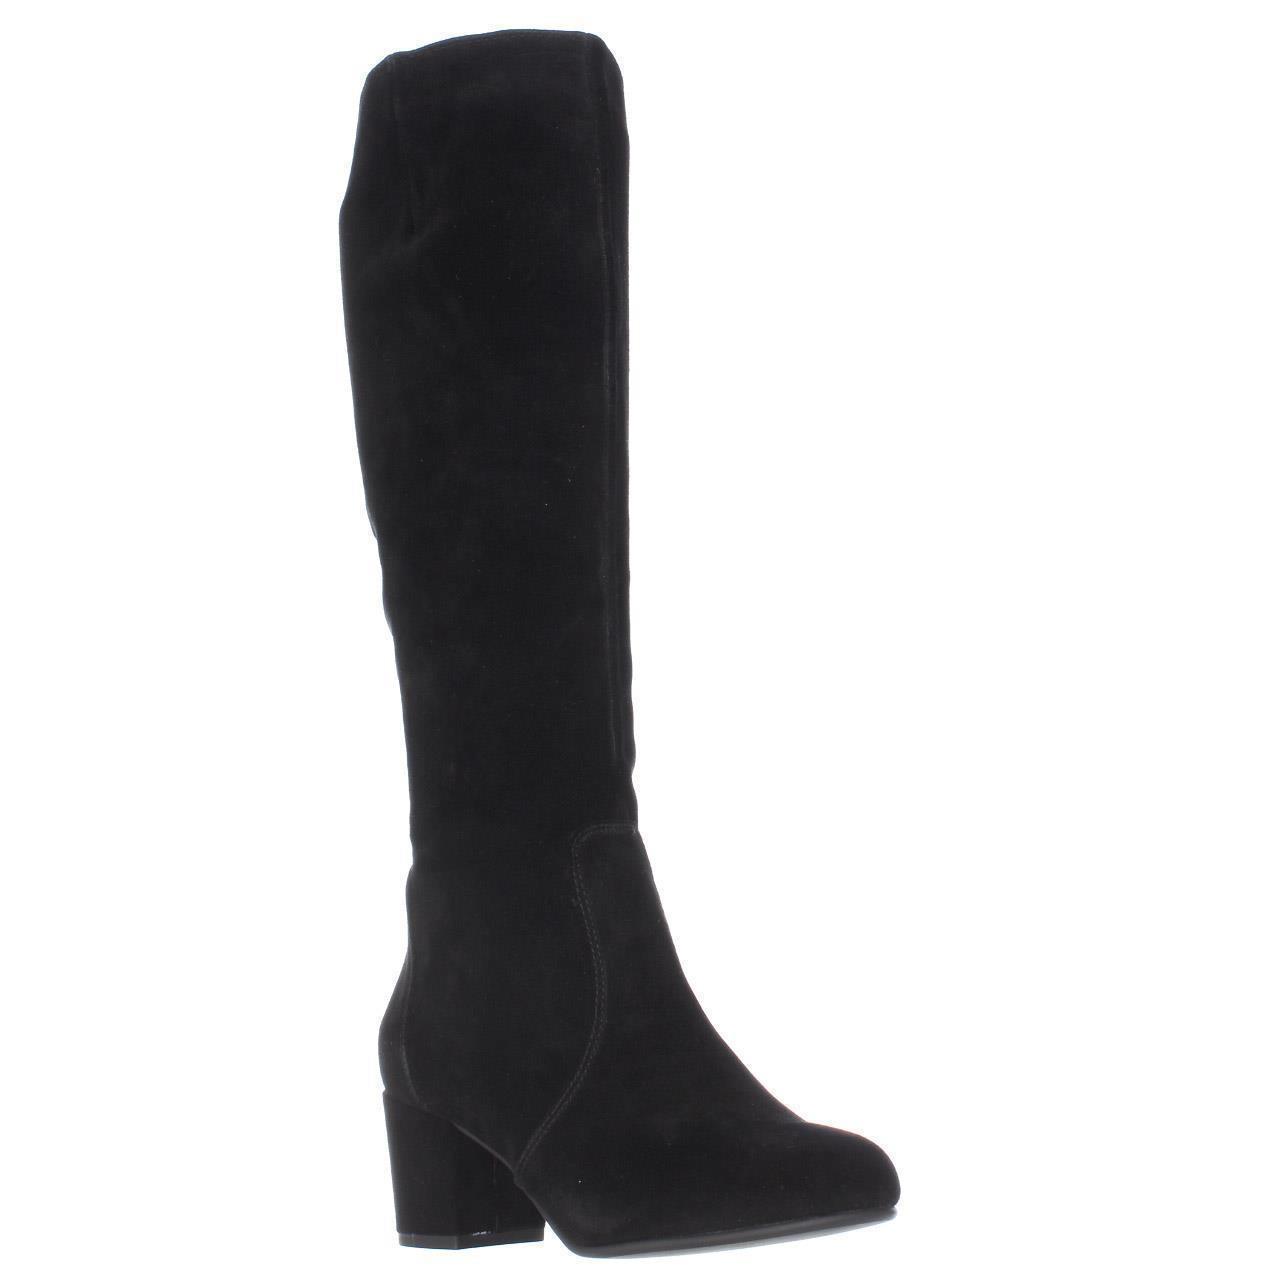 0d6e37fb6091 Lyst - Steve Madden Haydun Block Heel Tall Boots in Black